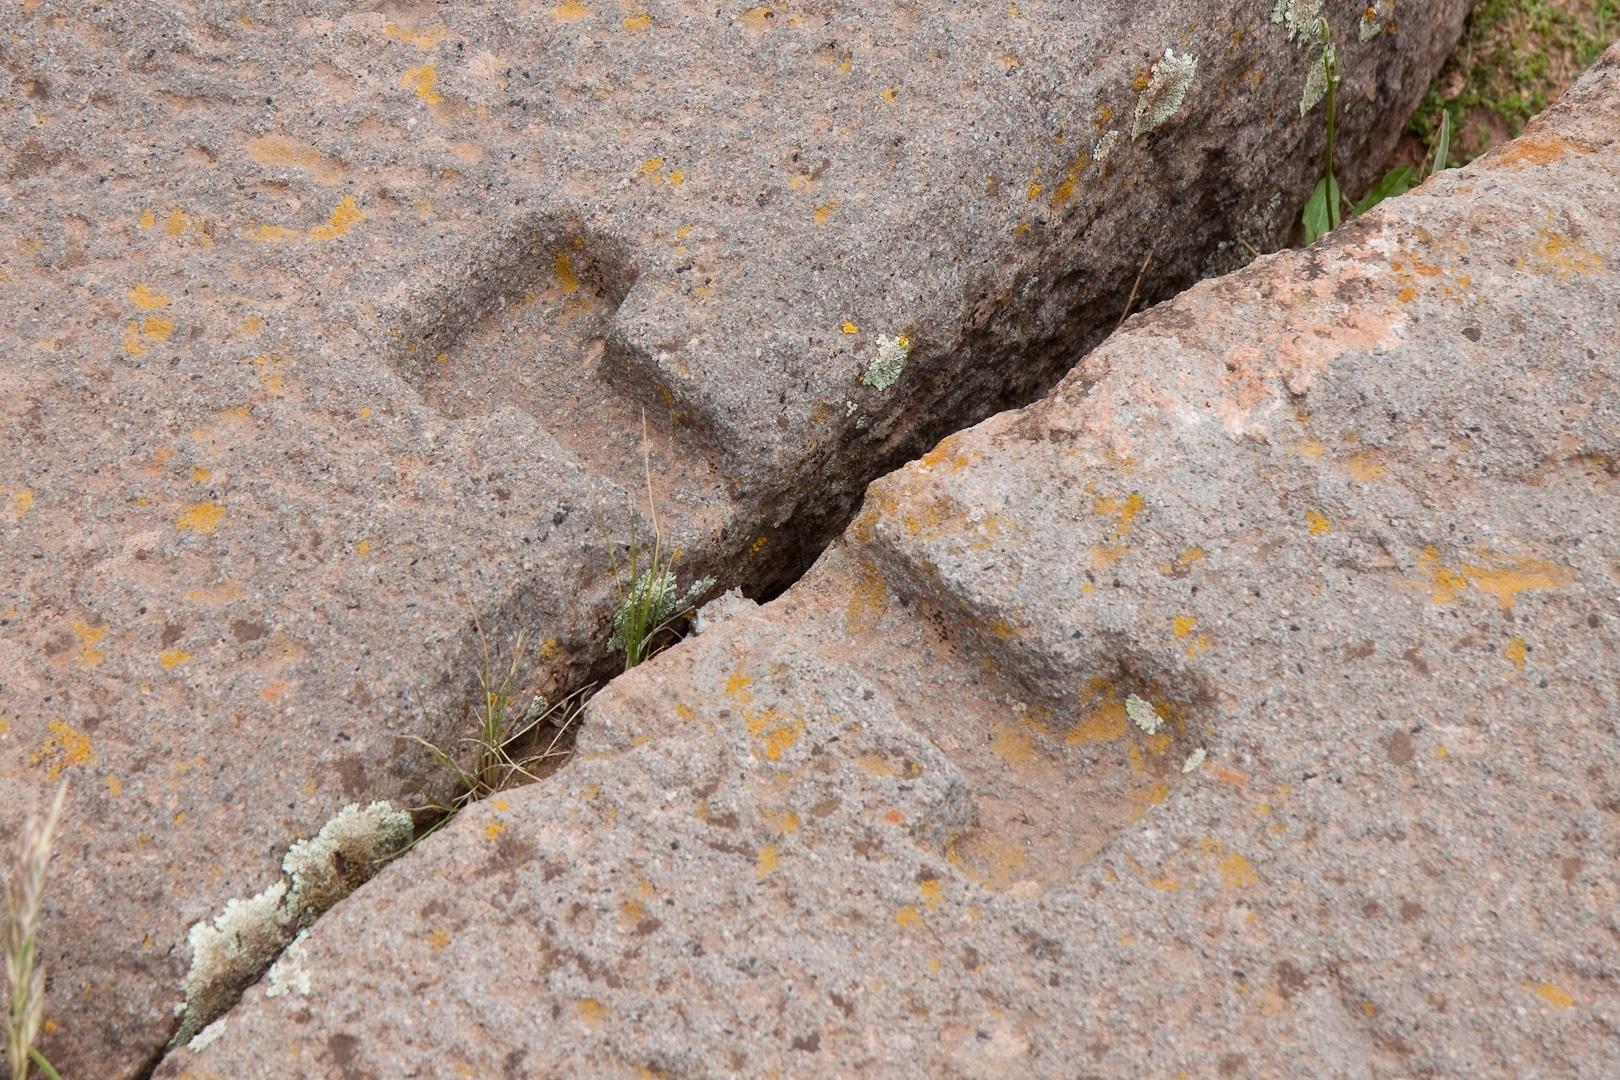 Tiwanaku Interlocking Piece between stones, Pumapunku